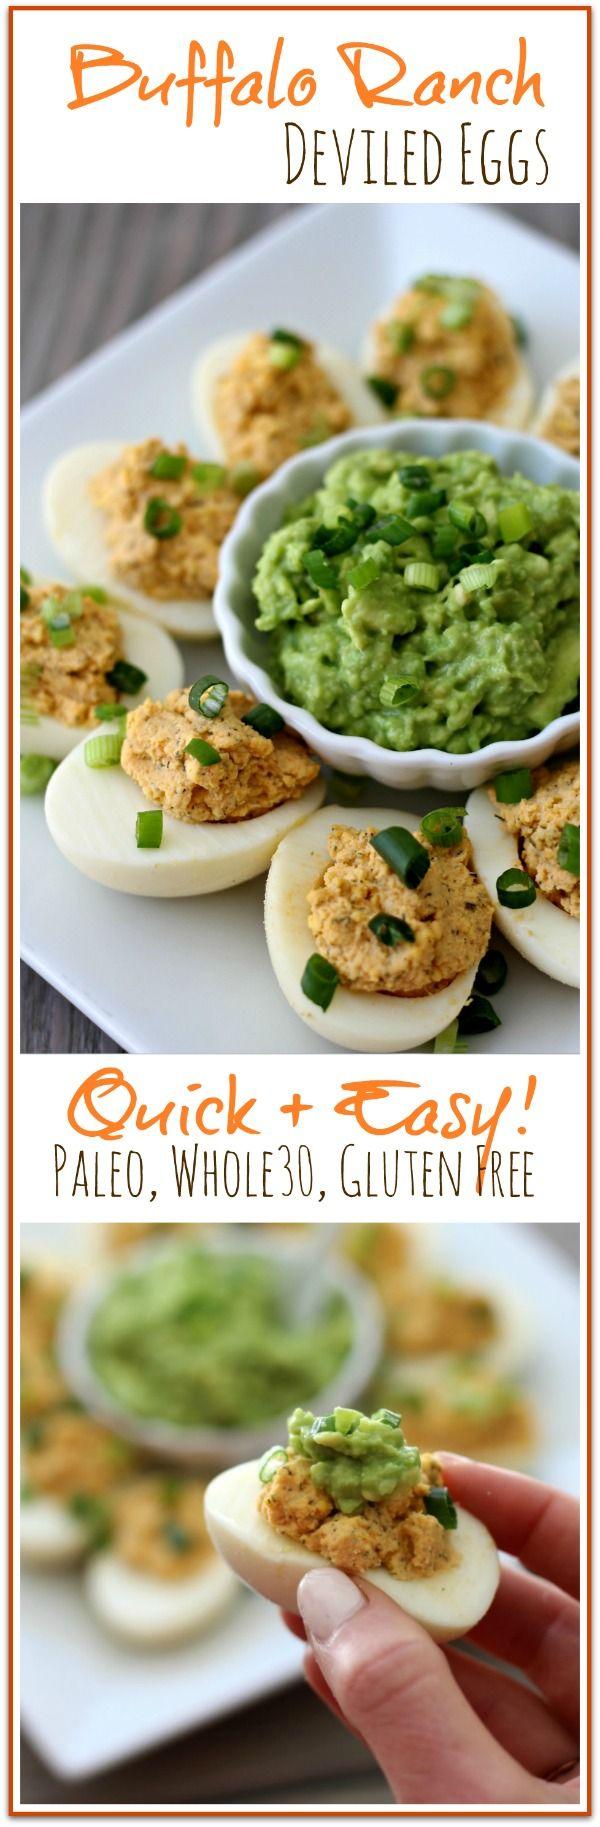 Buffalo Ranch Deviled Eggs (Paleo, Whole30, Gluten Free)